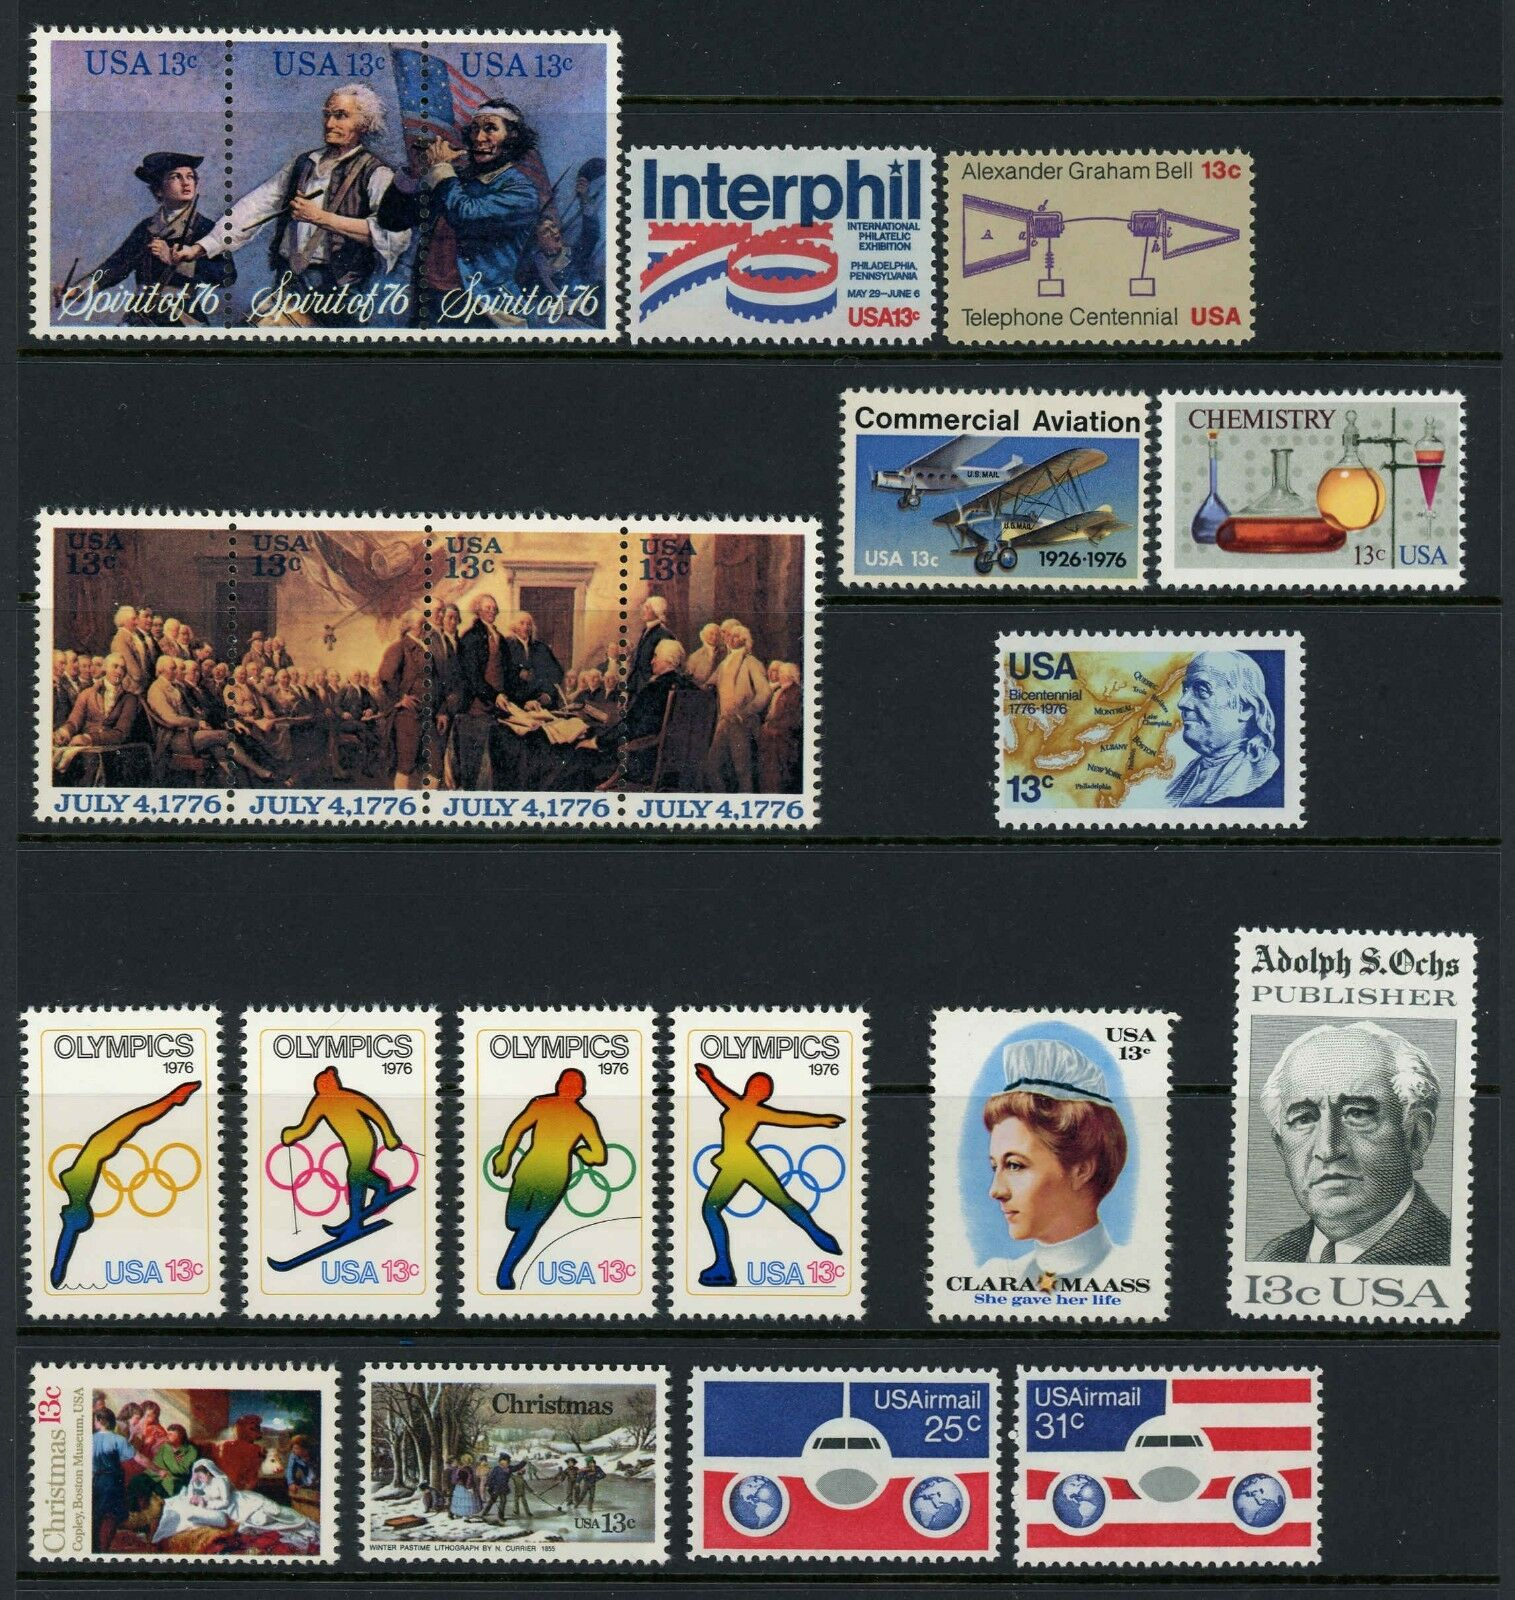 1976 U.S. Commemorative Year Mint Issues, Set of 22 Min